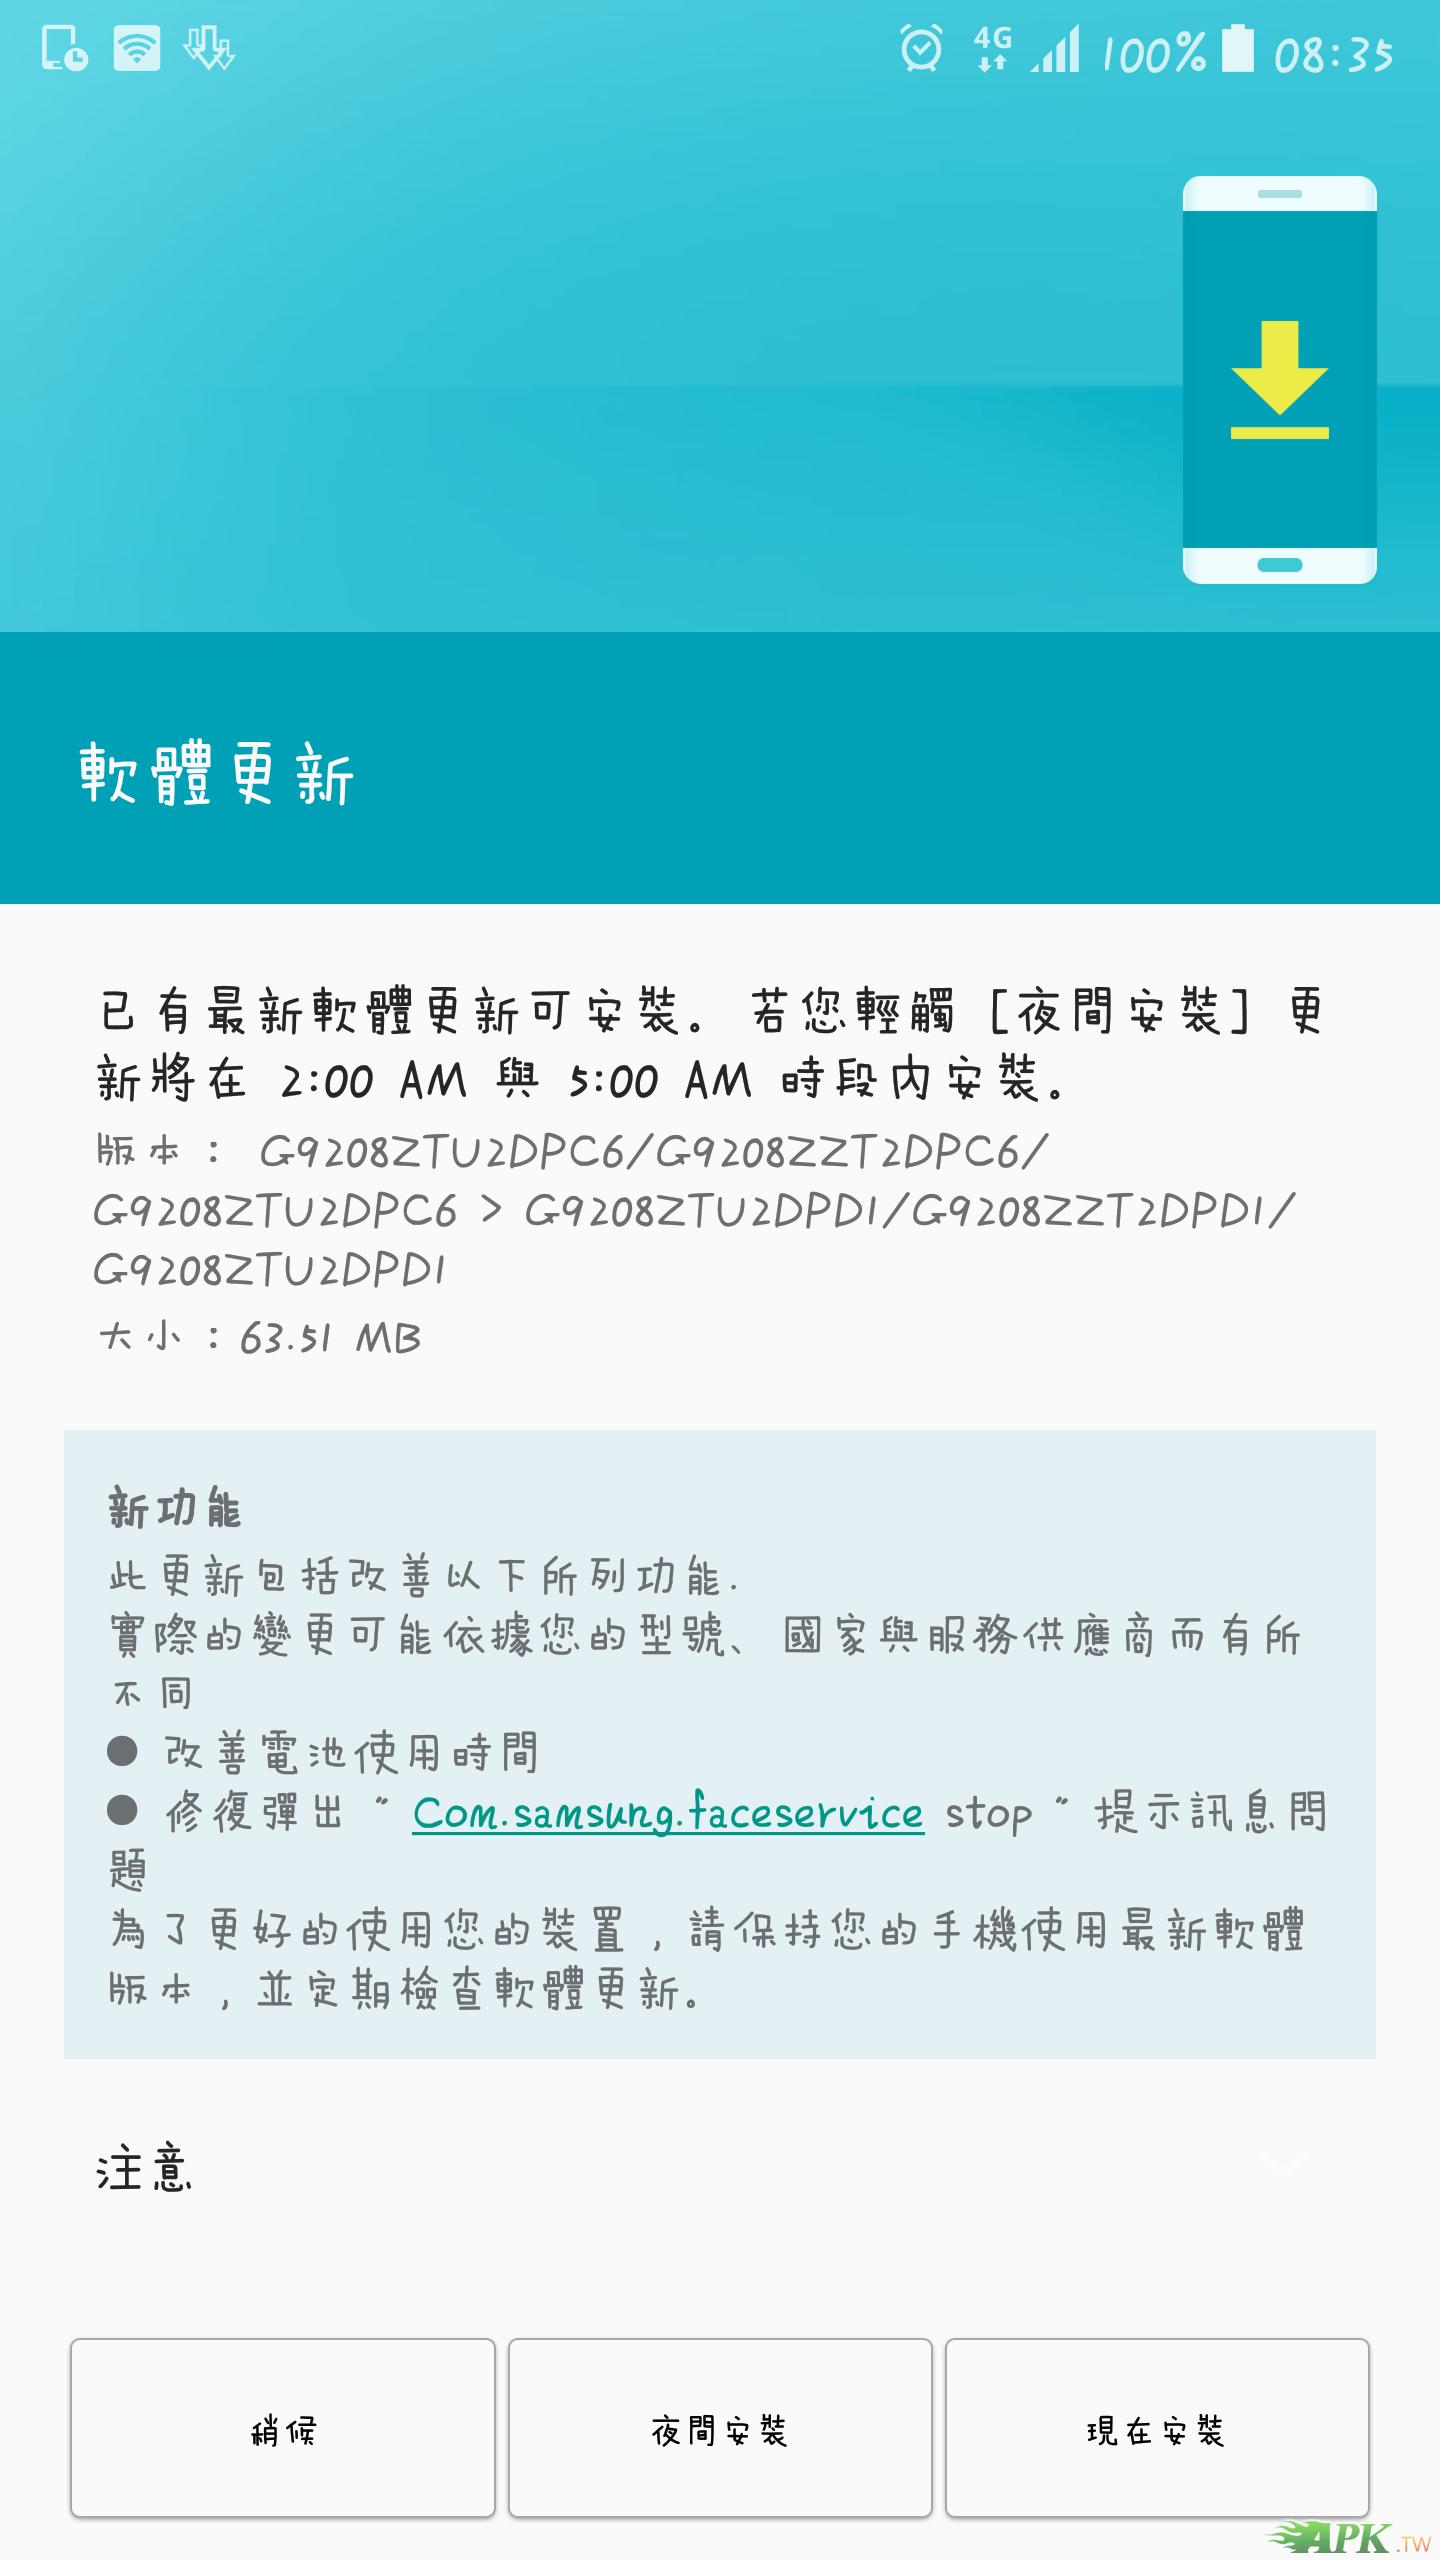 Screenshot_20160423-083549.png